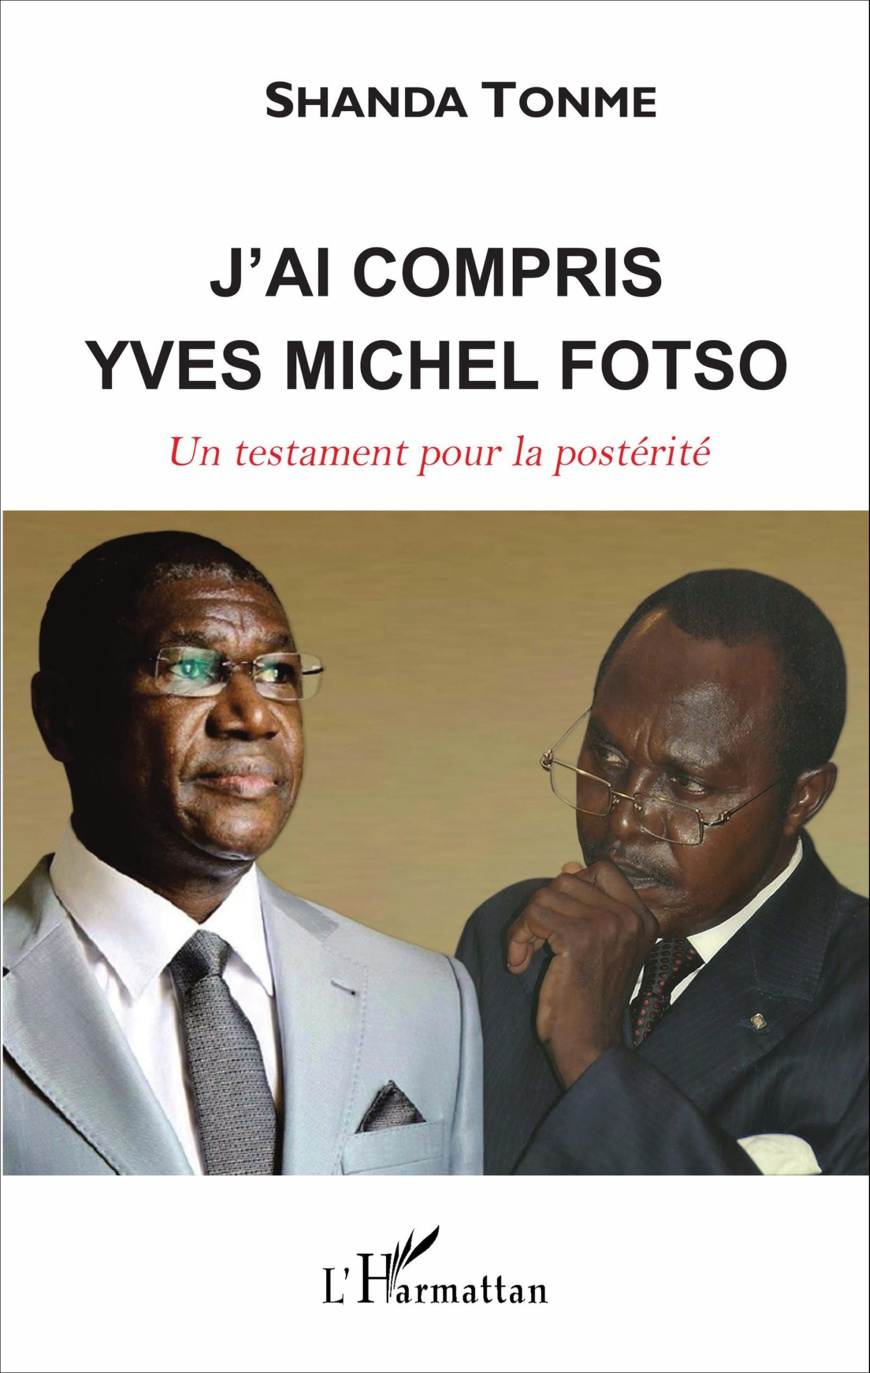 Cameroun:« YVES MICHEL FOTSO N'EST QU'UN SIMPLE DELINQUANT »!